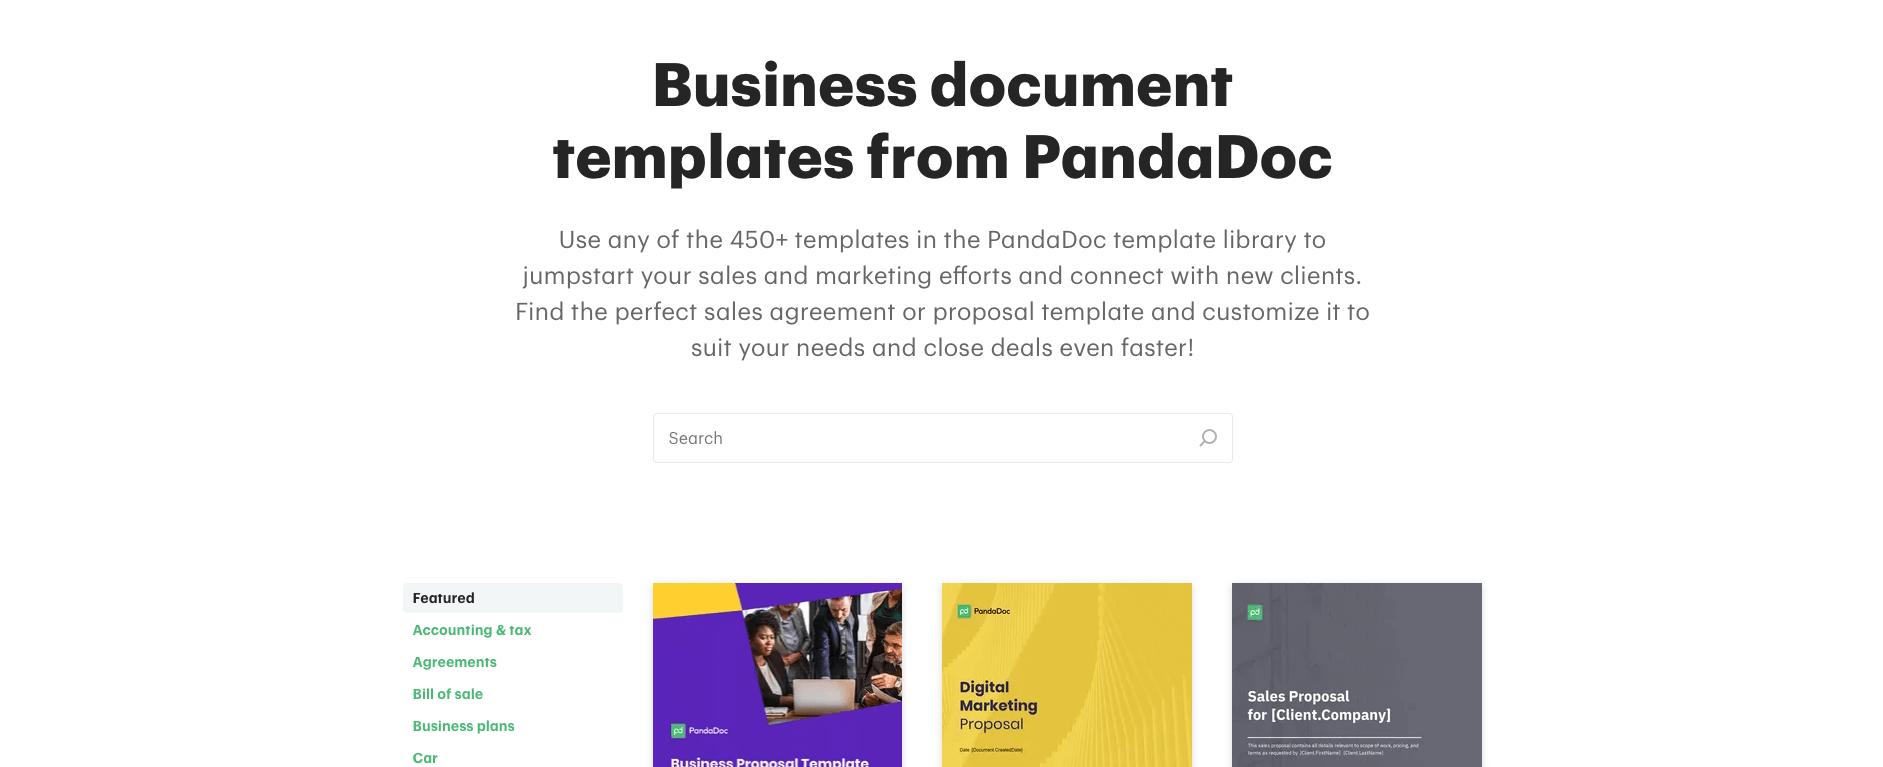 Pandadoc-template-search-screenshot